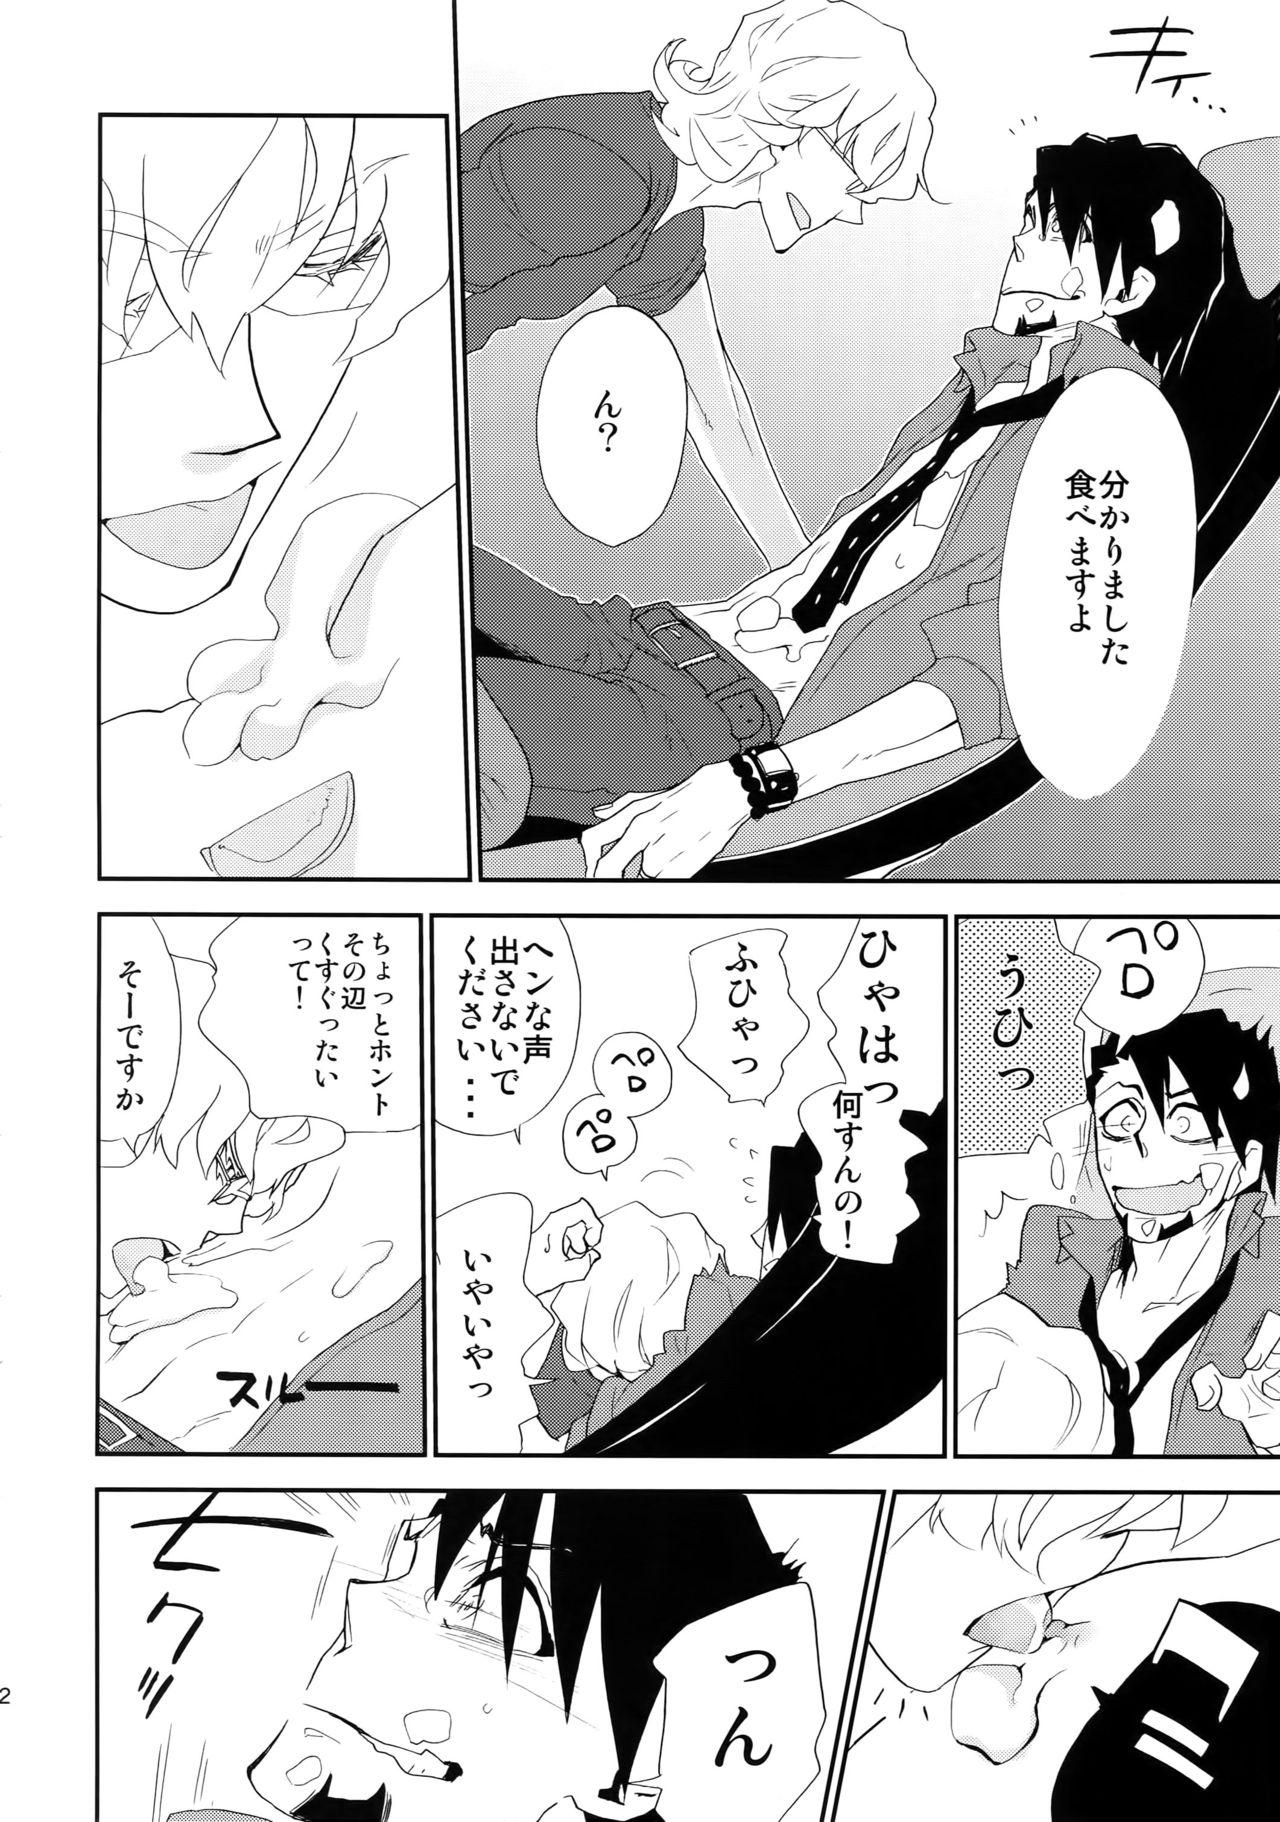 T&B Sairoku! 10